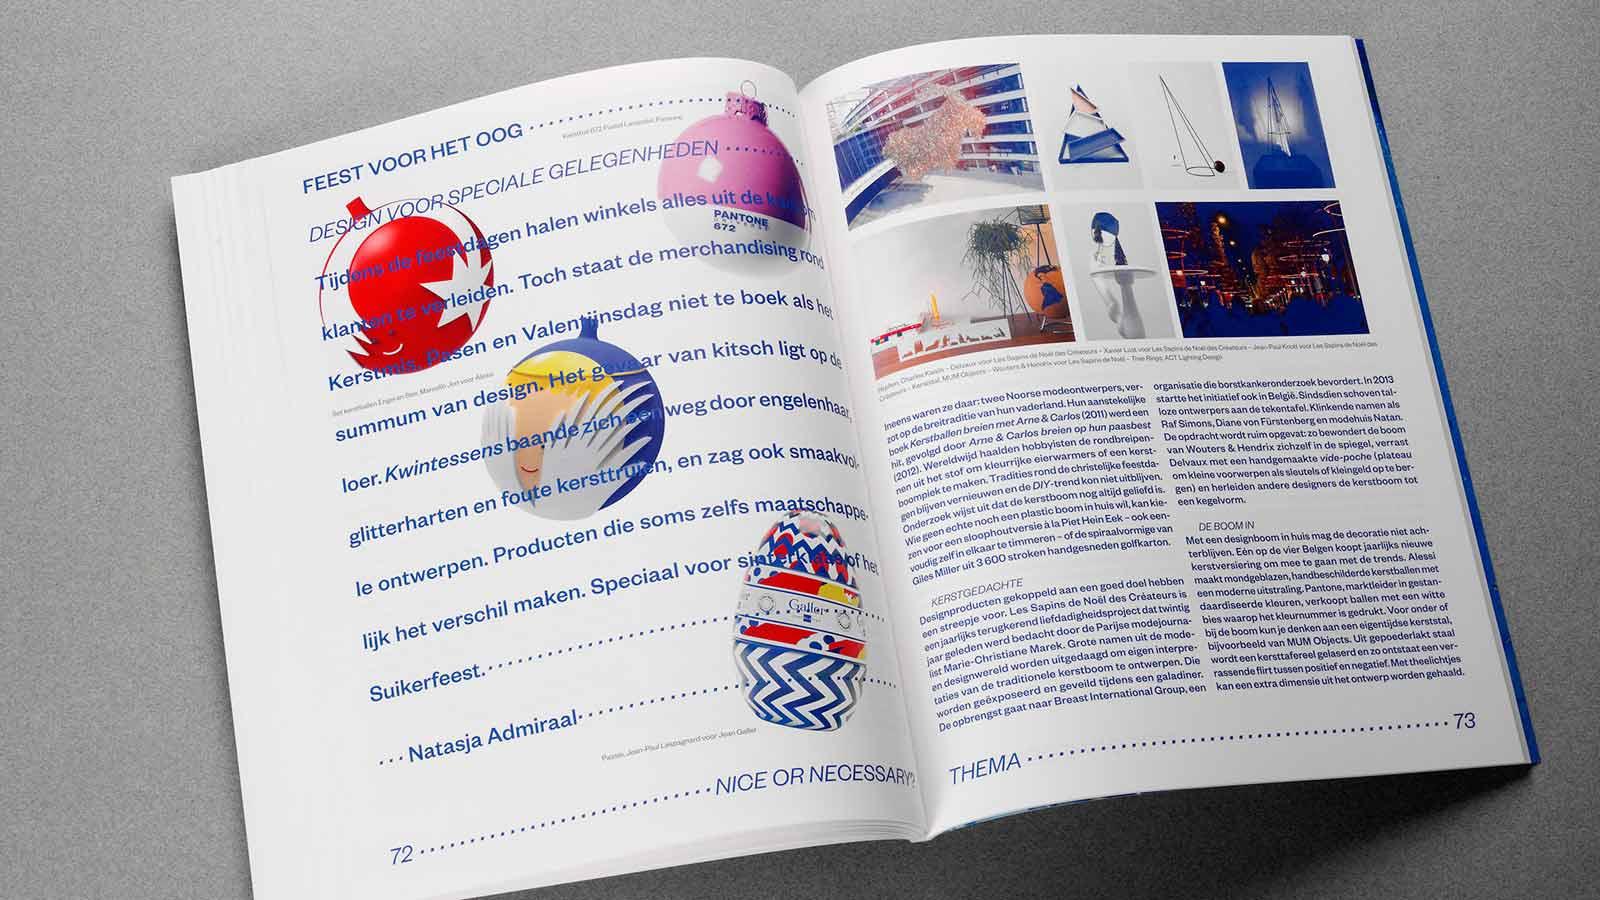 Kwintessens-2016-Paginas-17821-72b